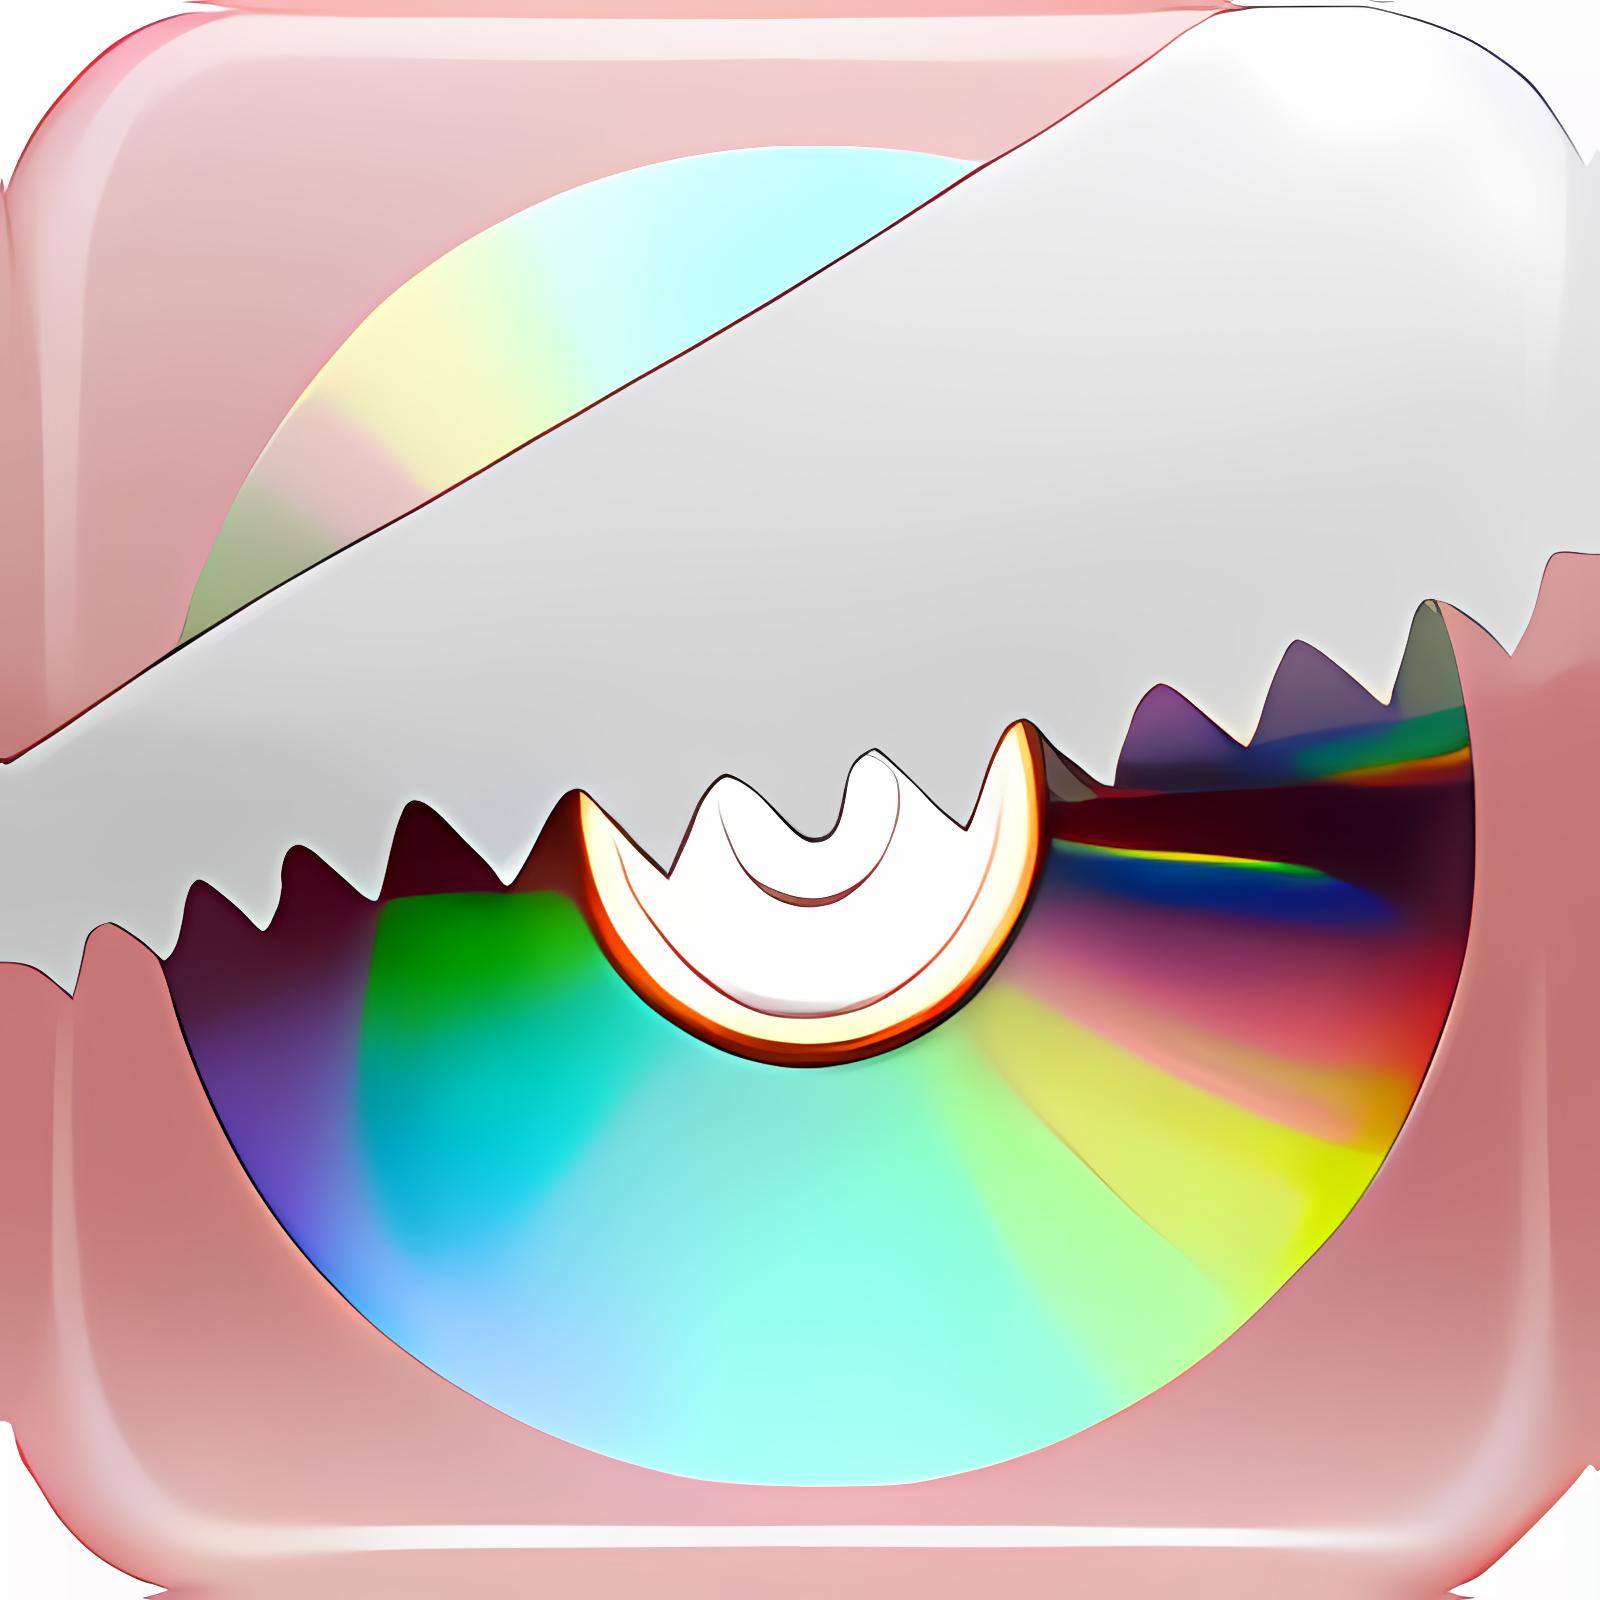 MP3 Knife 3.6